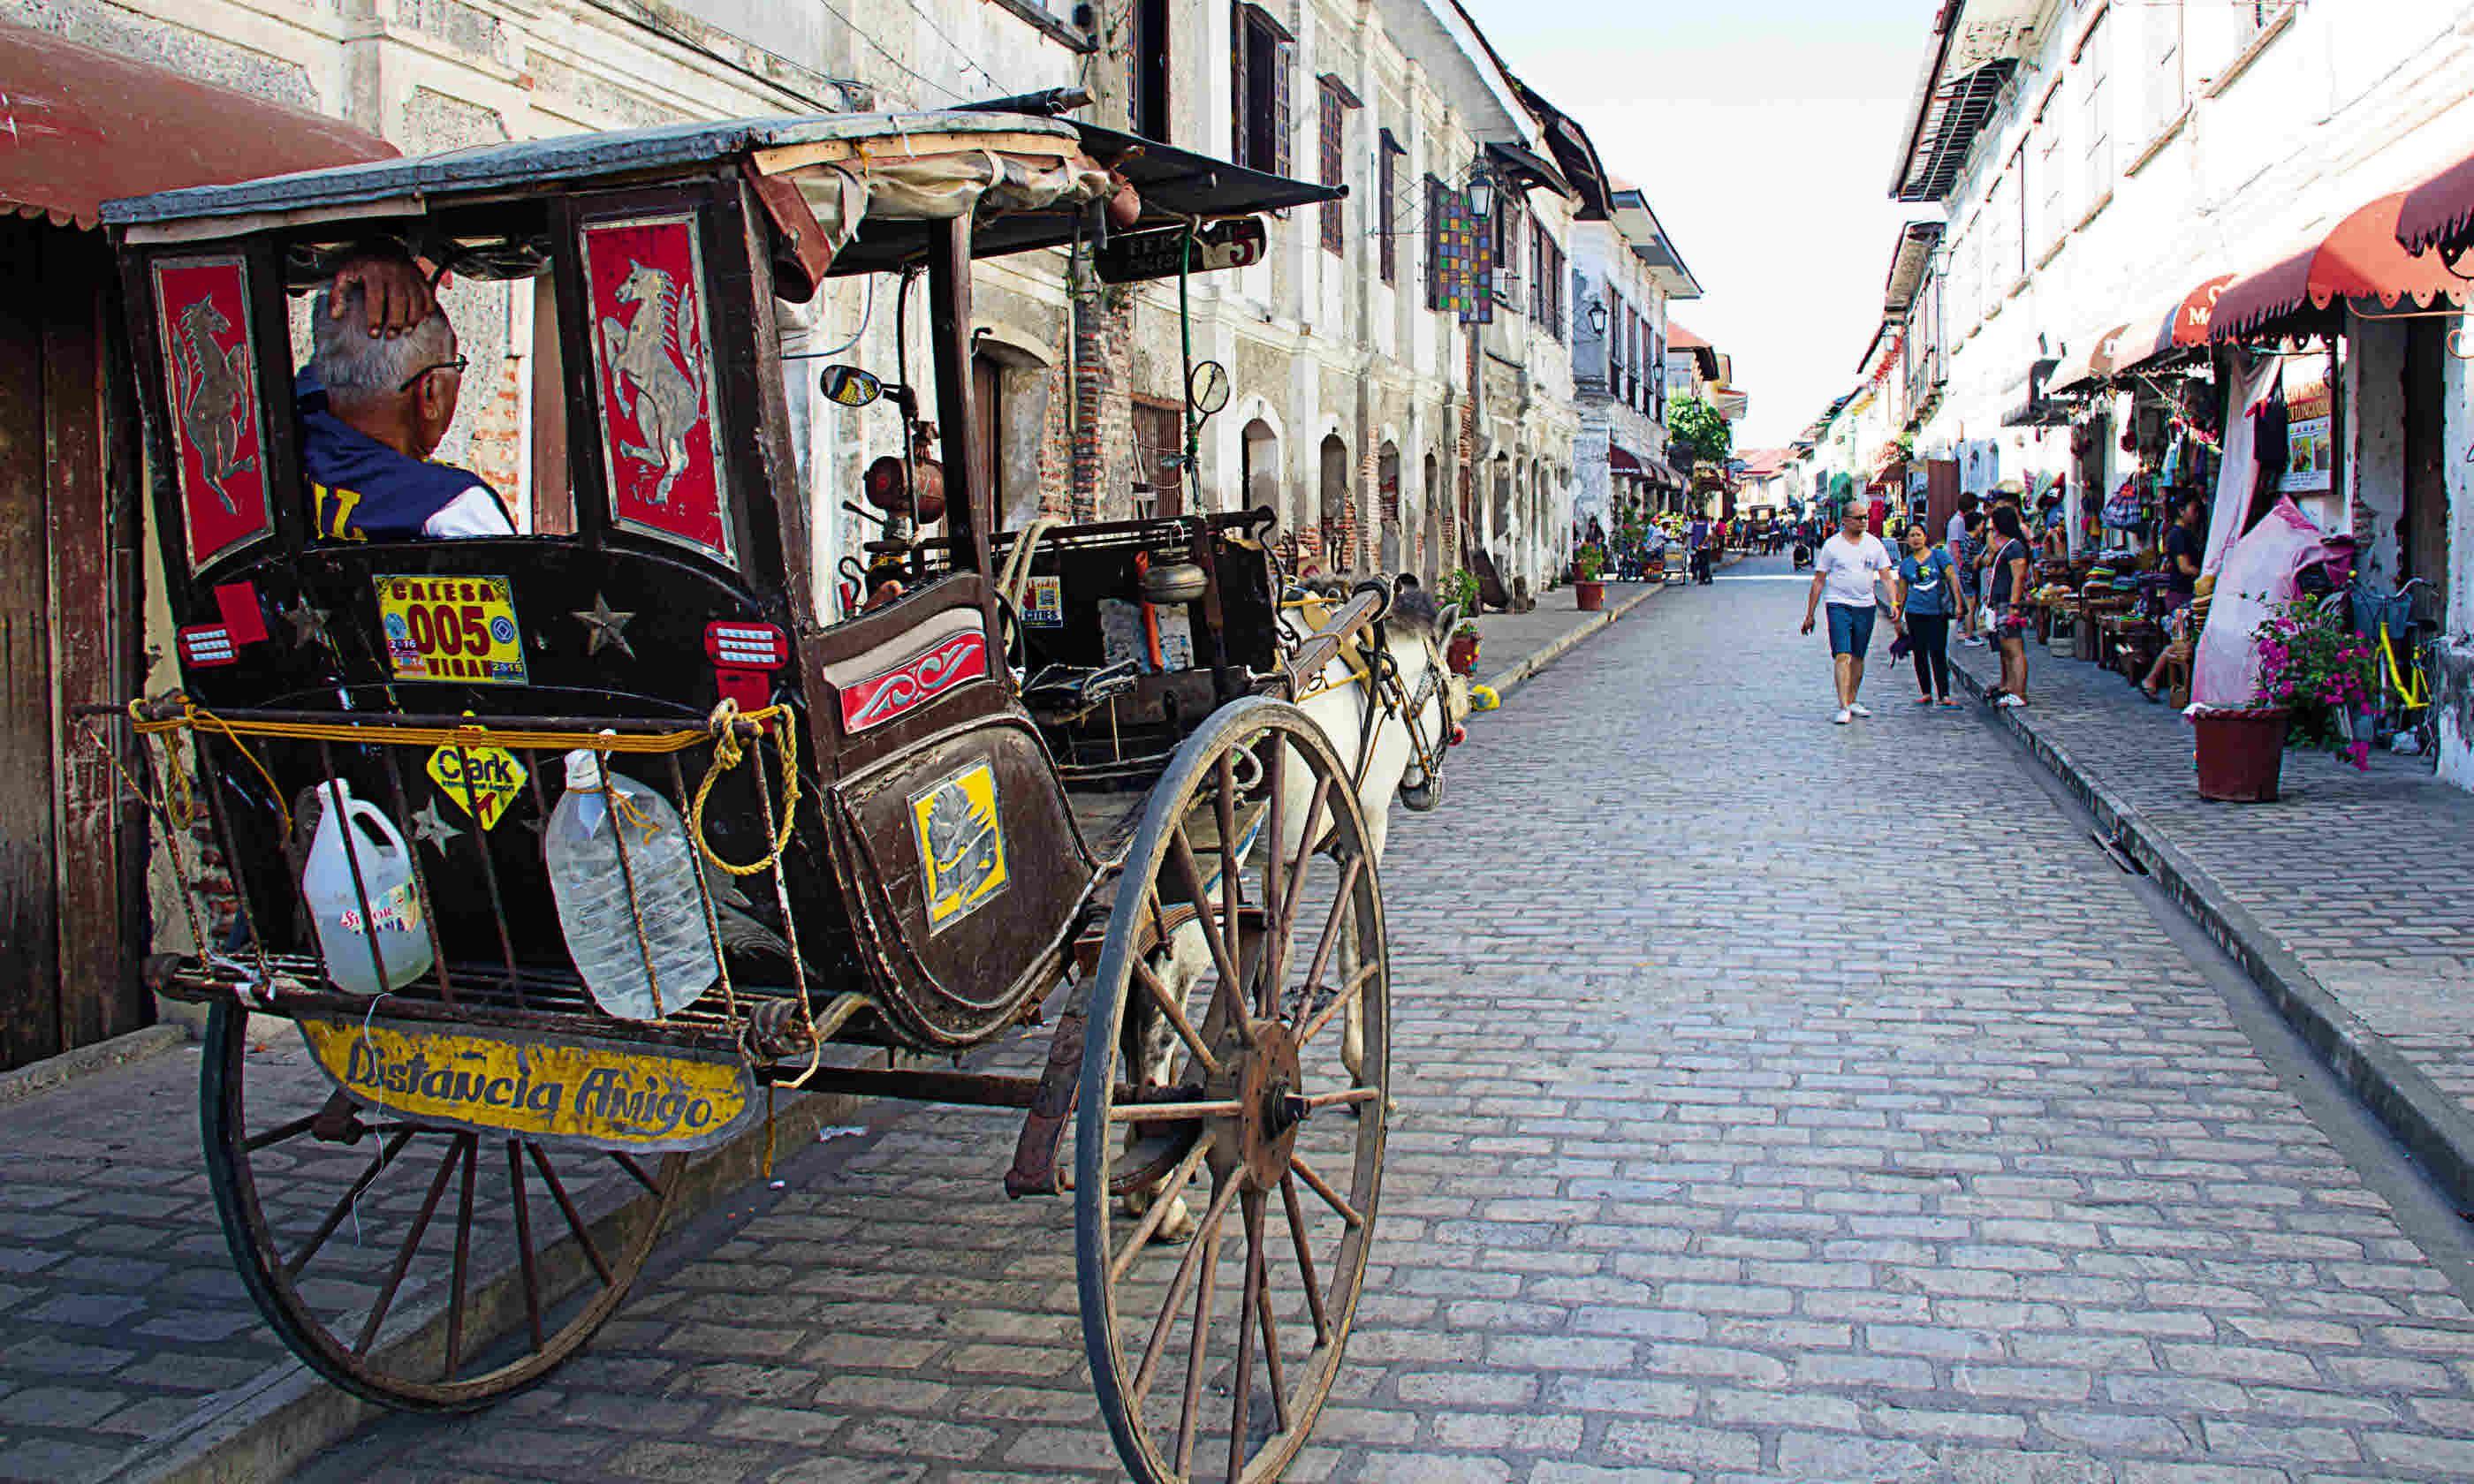 A horse and cart ride through Vigan (Nick Boulos)